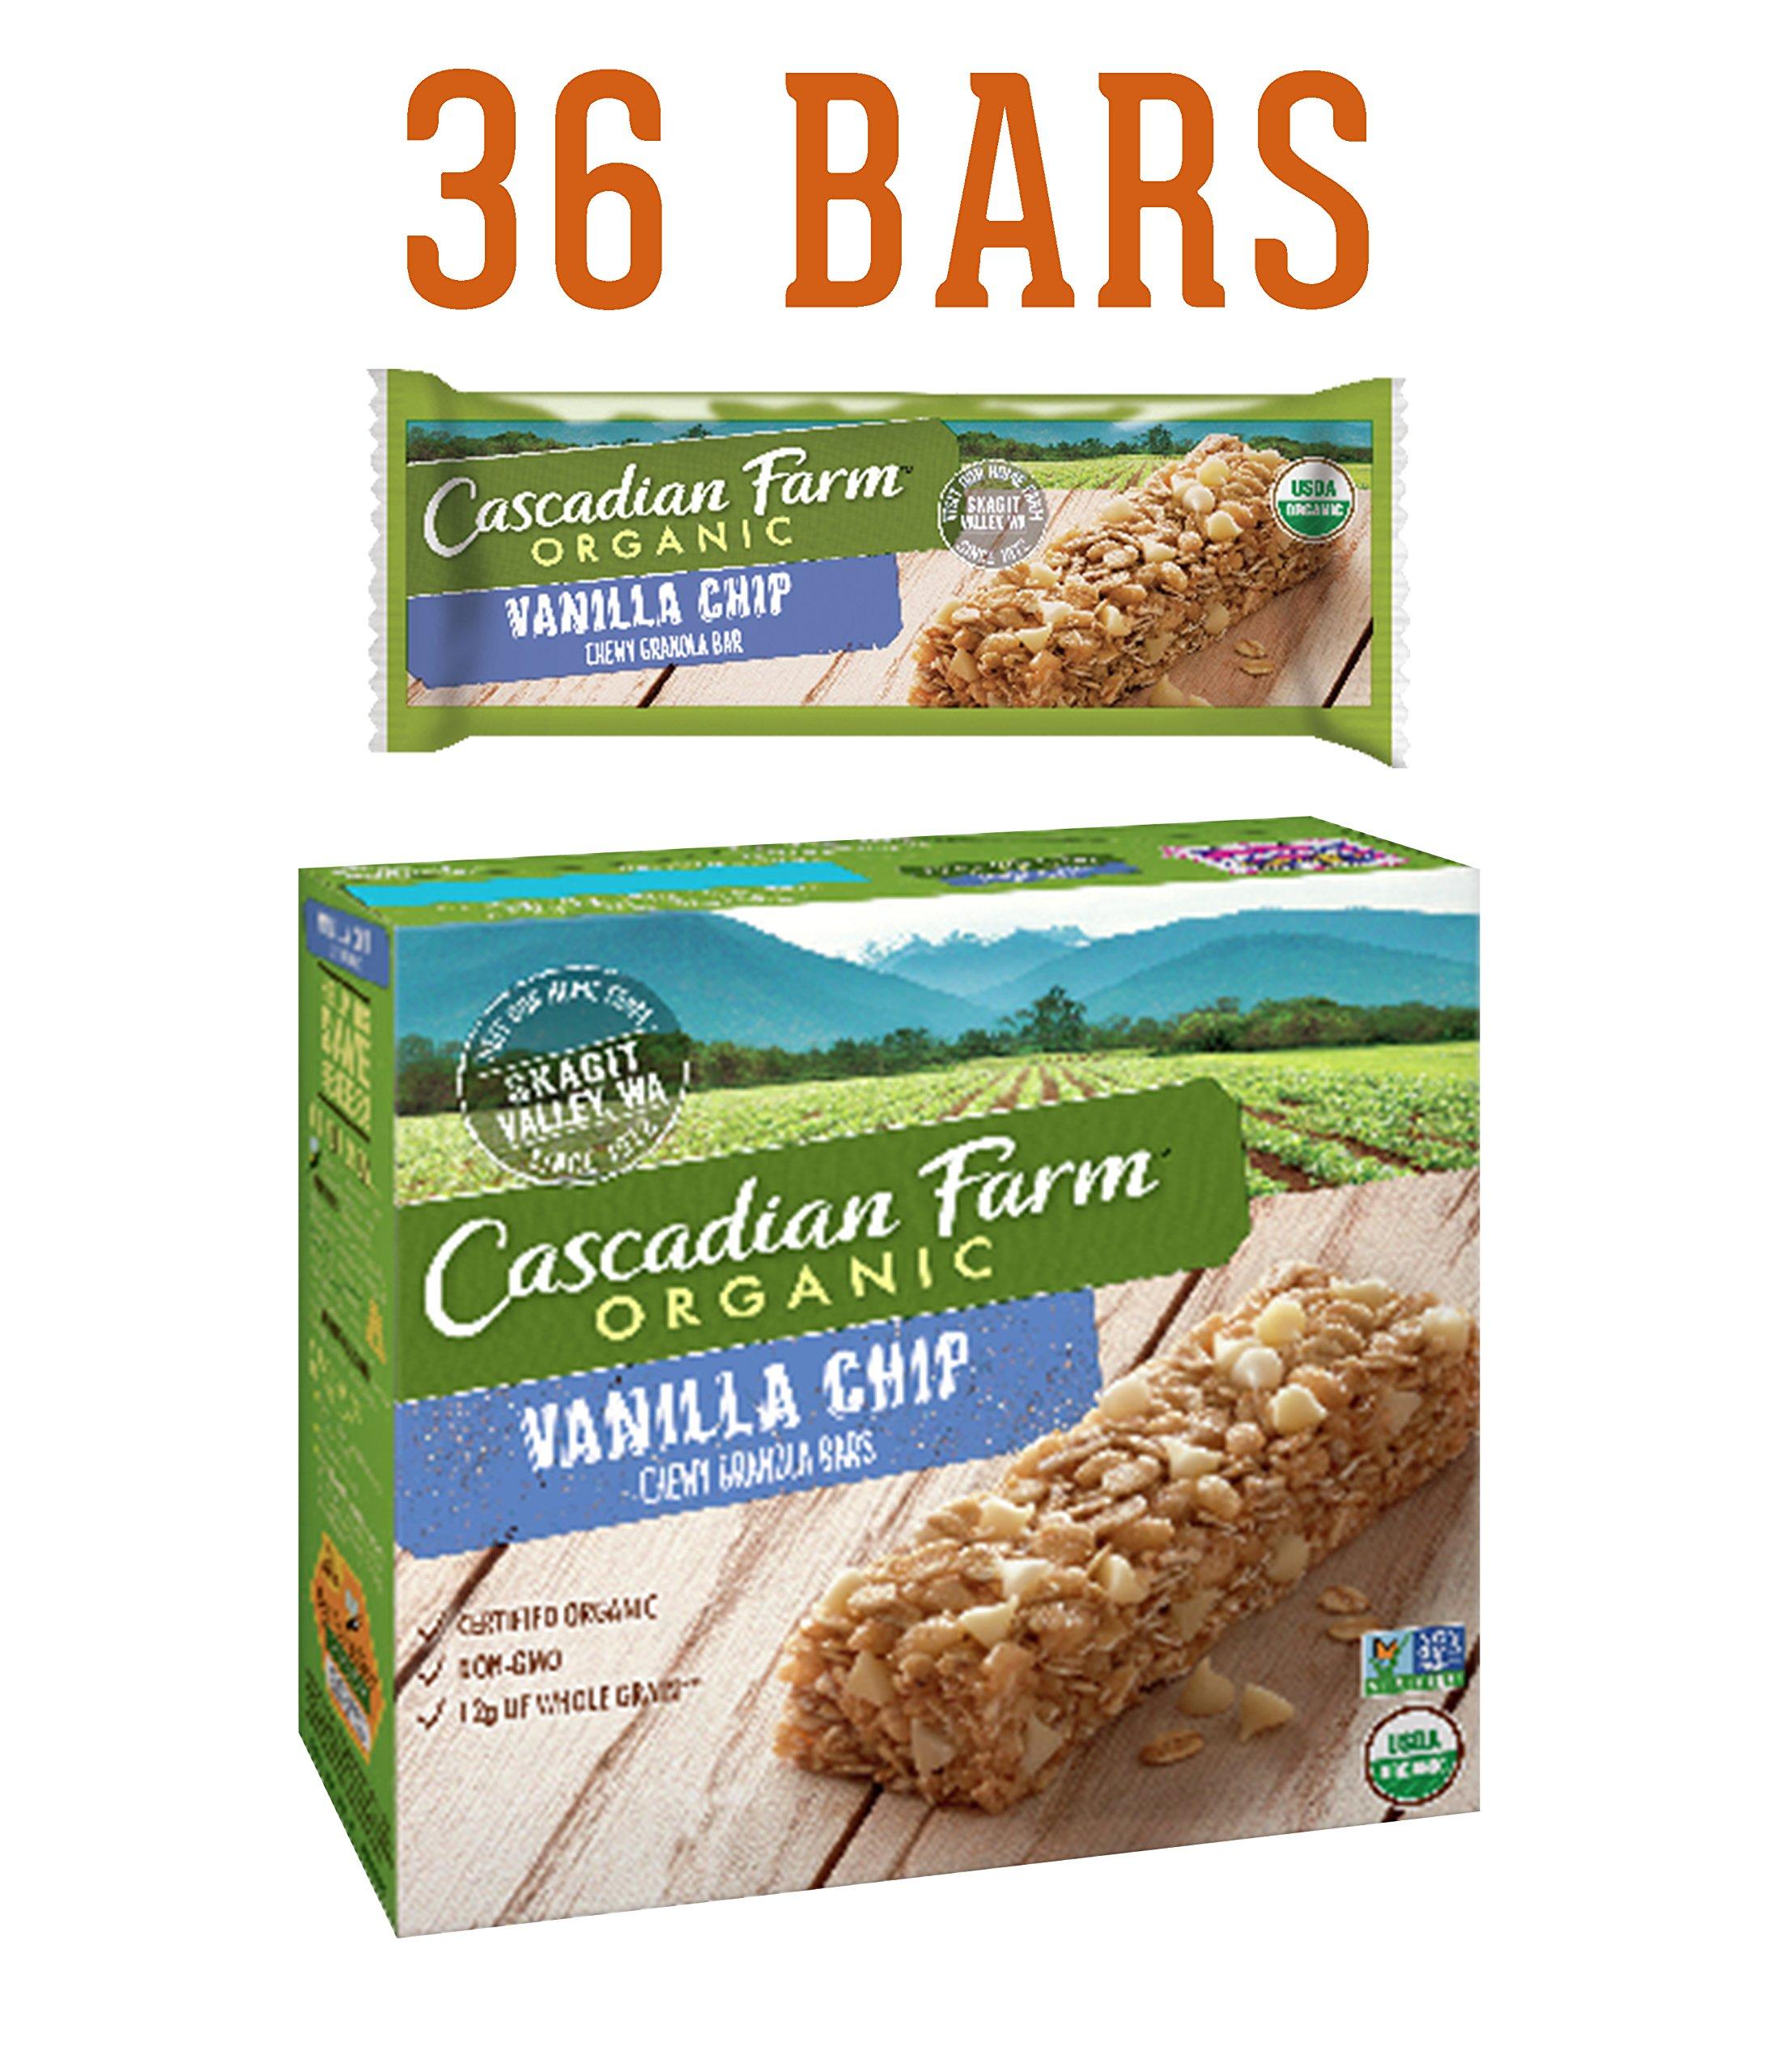 Cascadian Farm Organic Granola Bars, Chocolate Chip Chewy